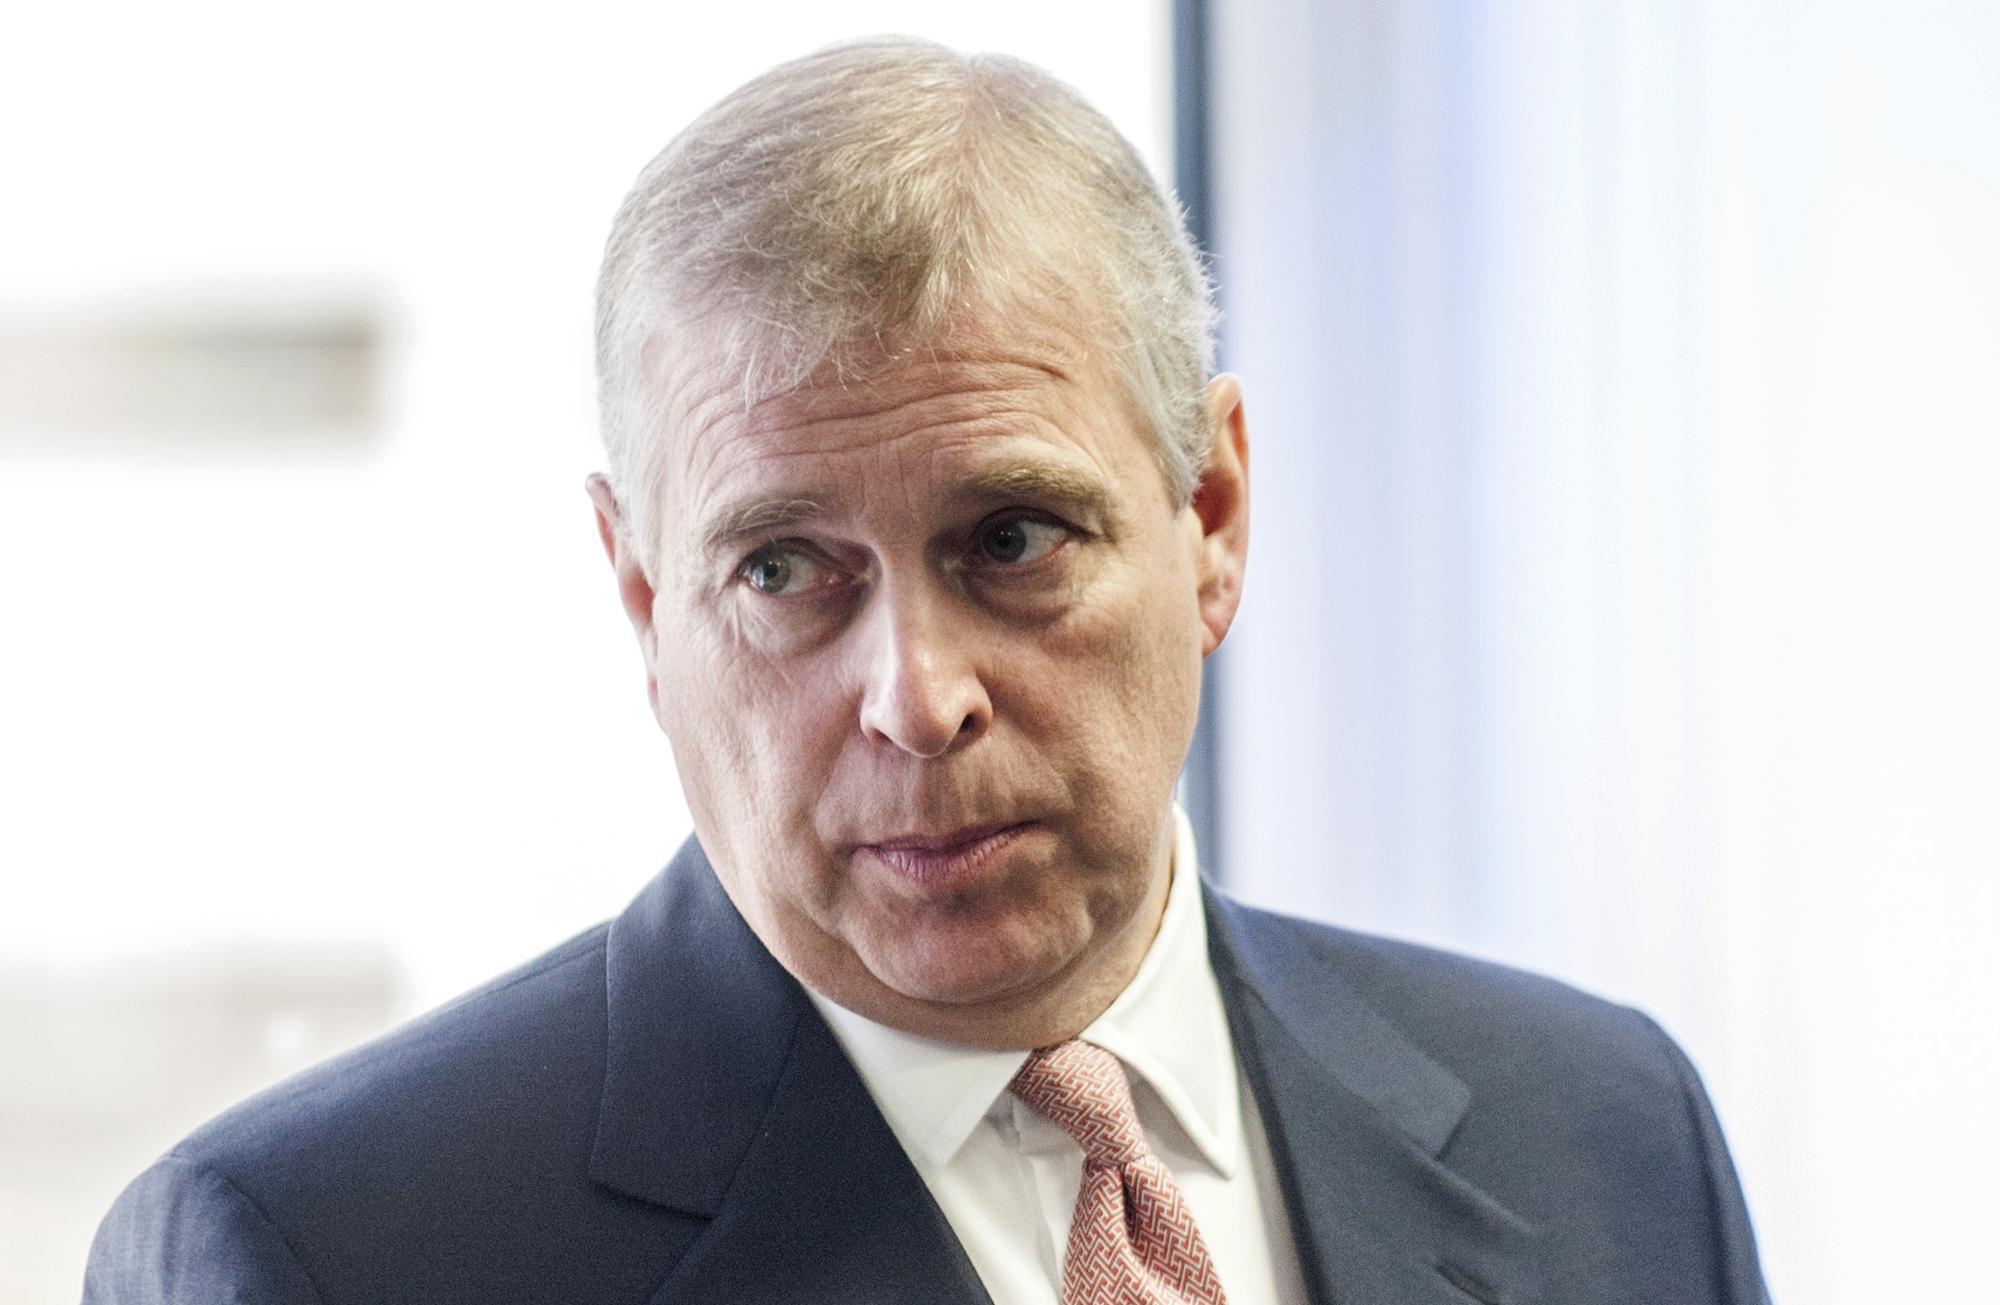 Prince Andrew steps away from public duties amid Jeffrey Epstein flap